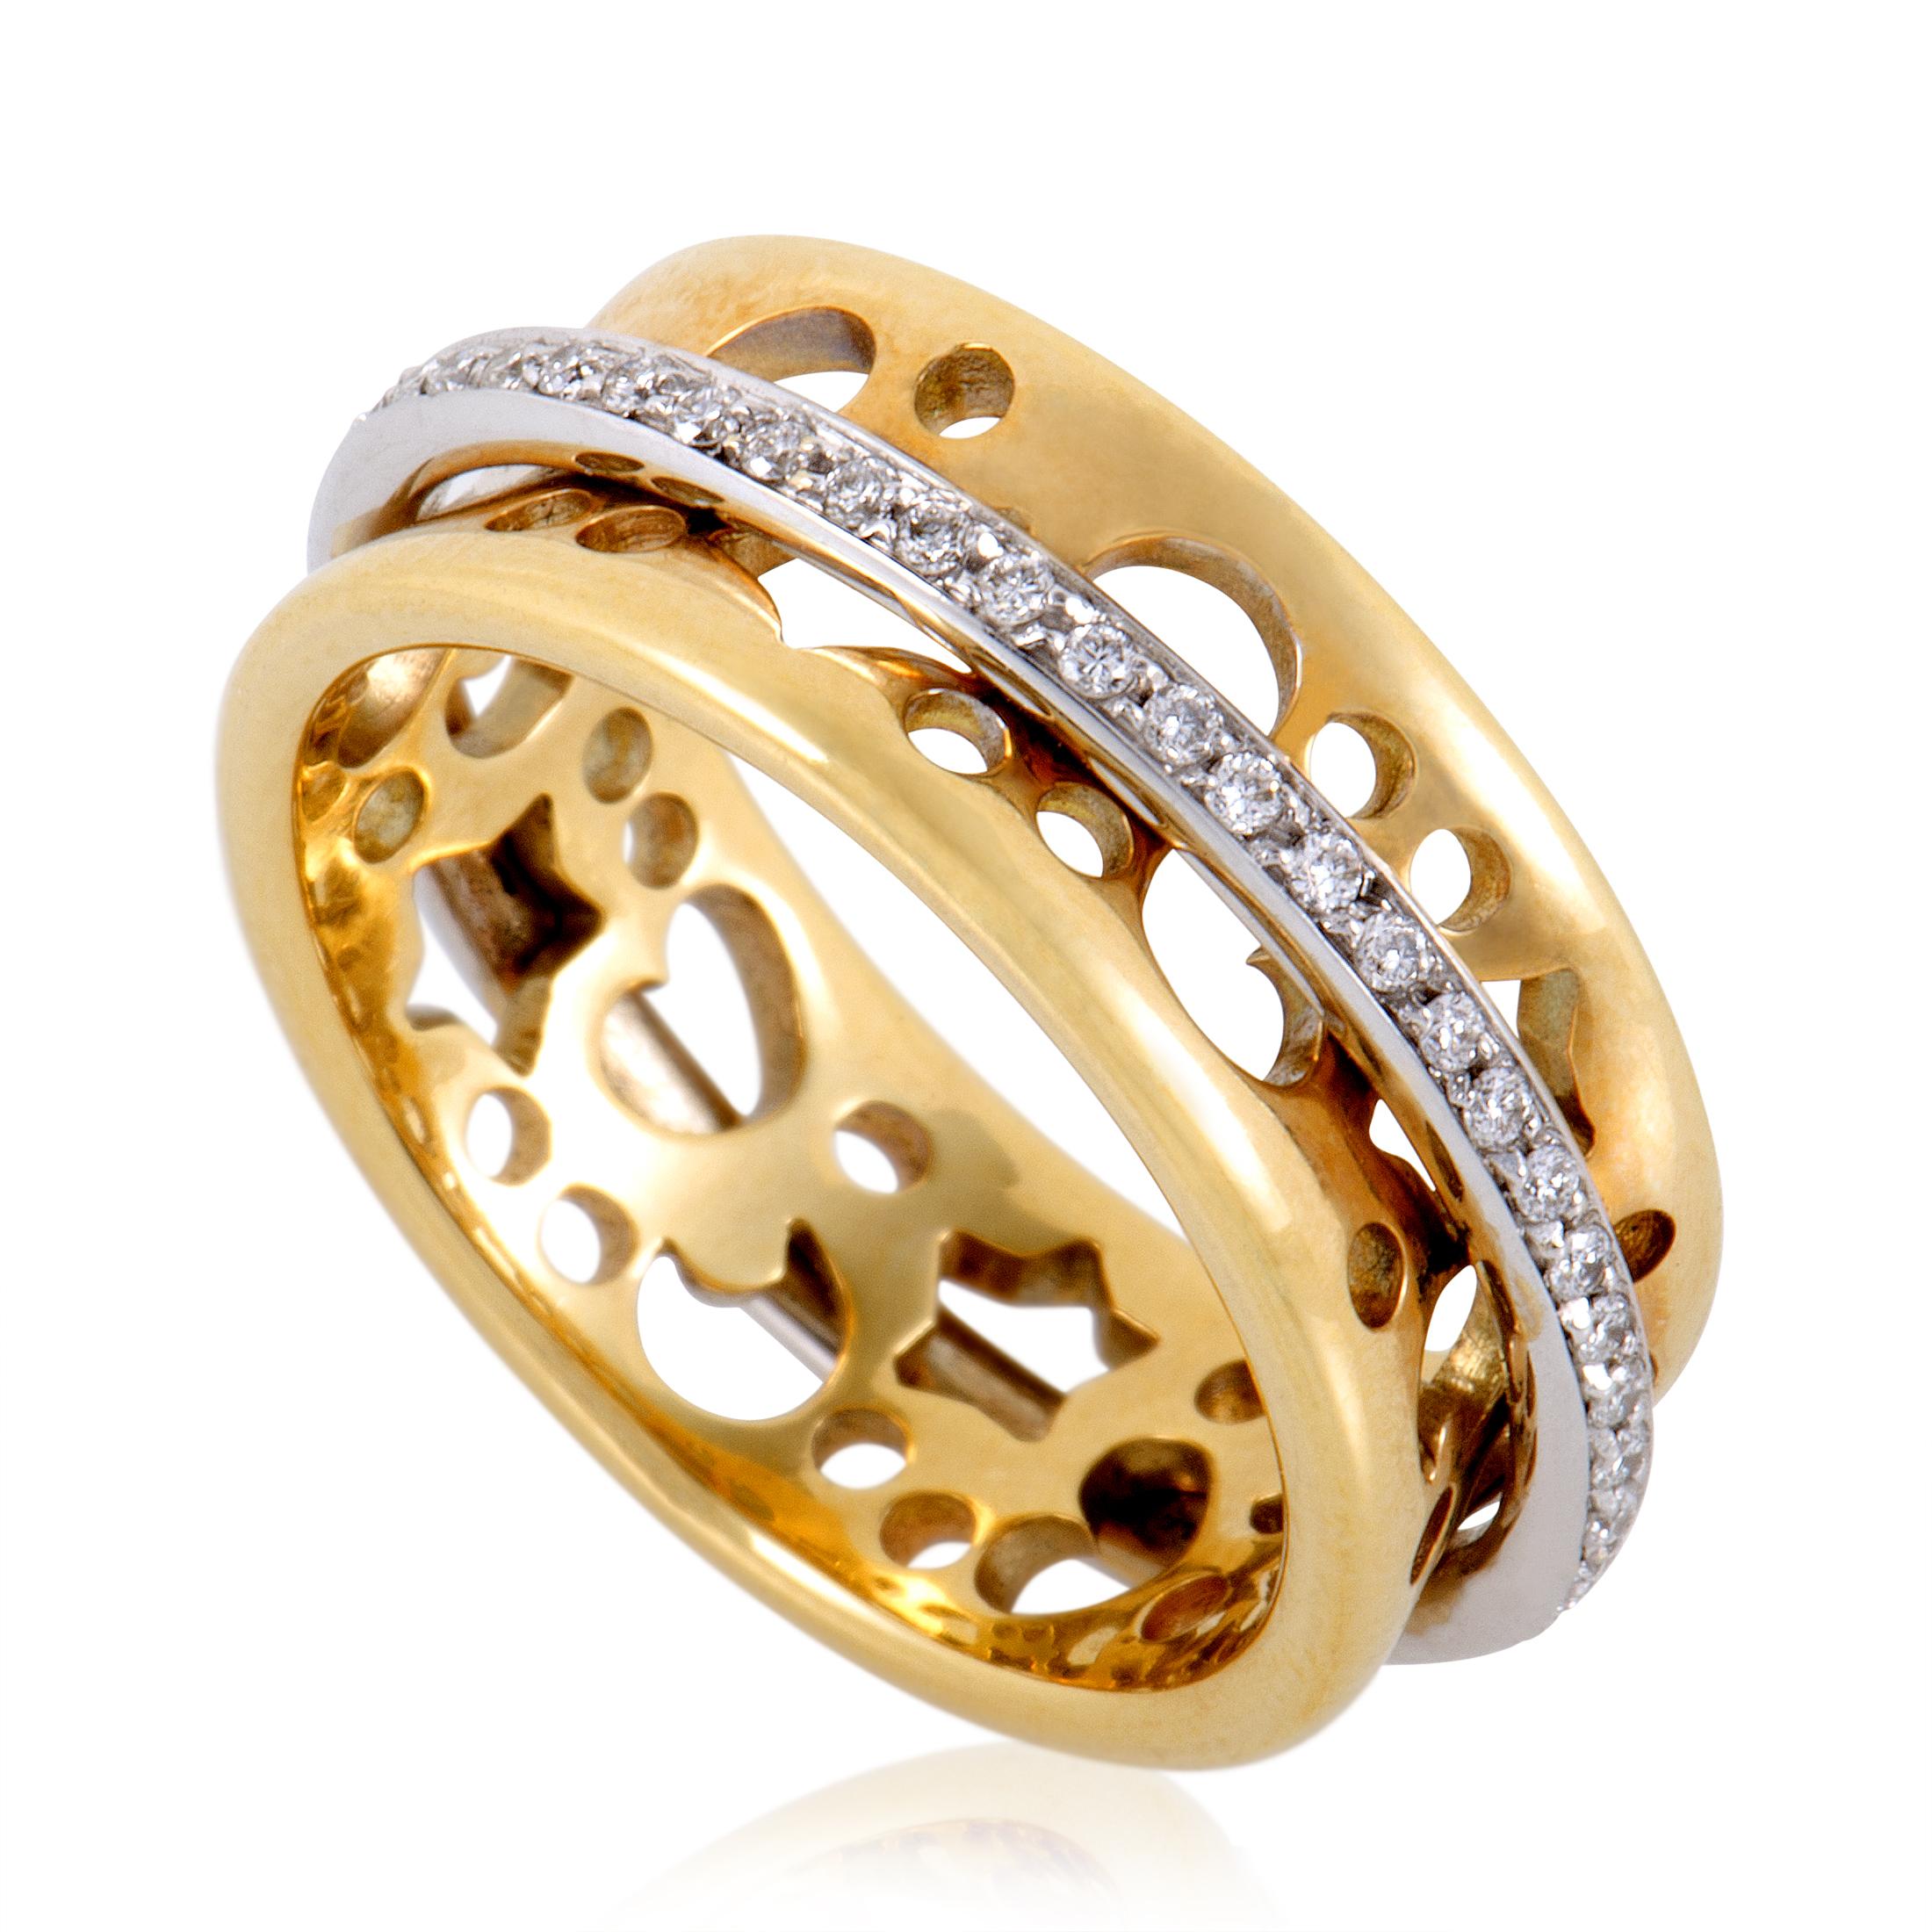 """""Pasquale Bruni Segni 18K Yellow and White Gold Diamond Band Ring Size"""""" 1364845"